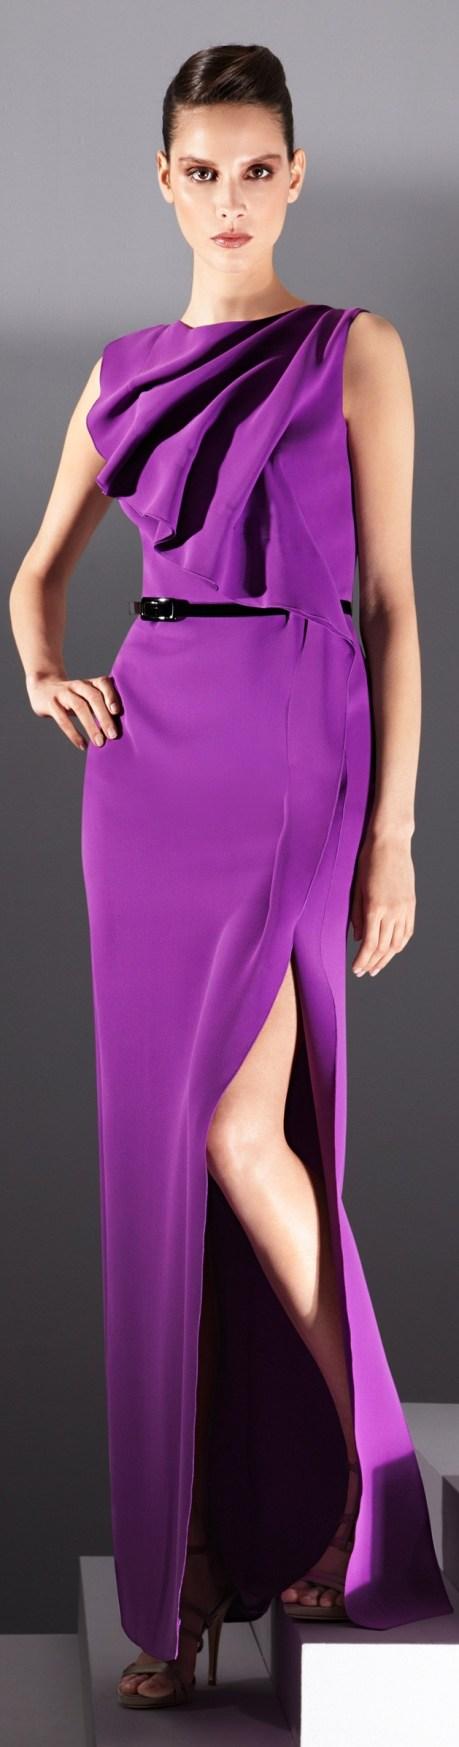 Fustana 2015 modele te fustanave 2015 dresses 2015 fustana modele te - Violeta